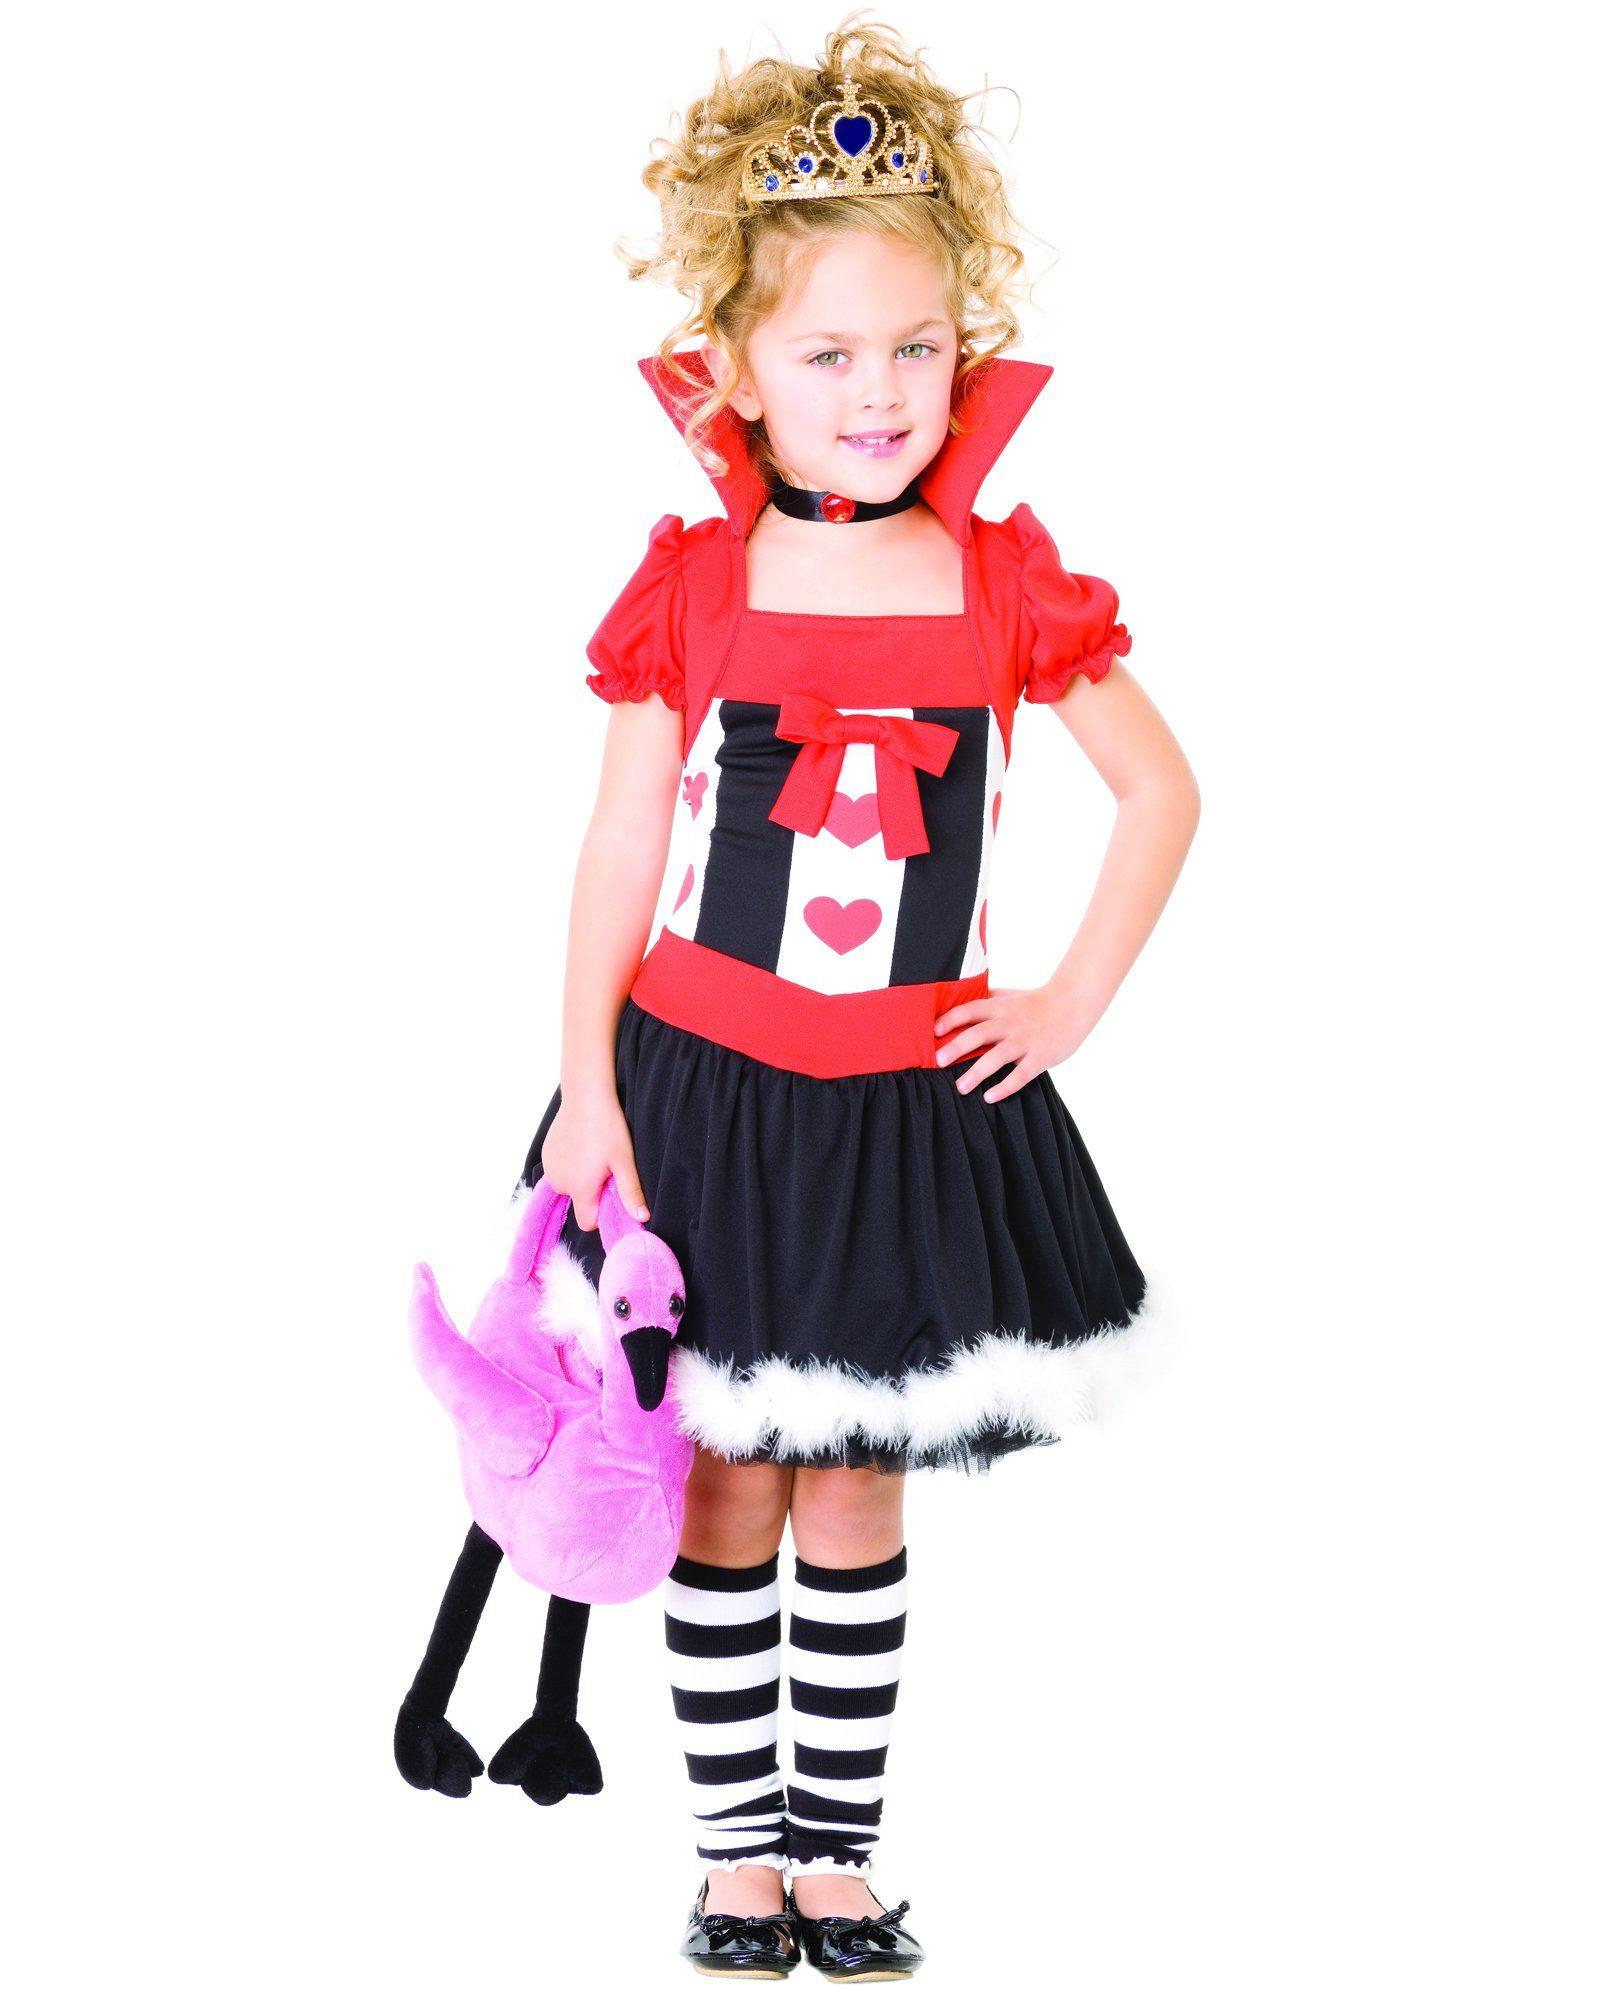 X Small costume for decor Queen of hearts costume